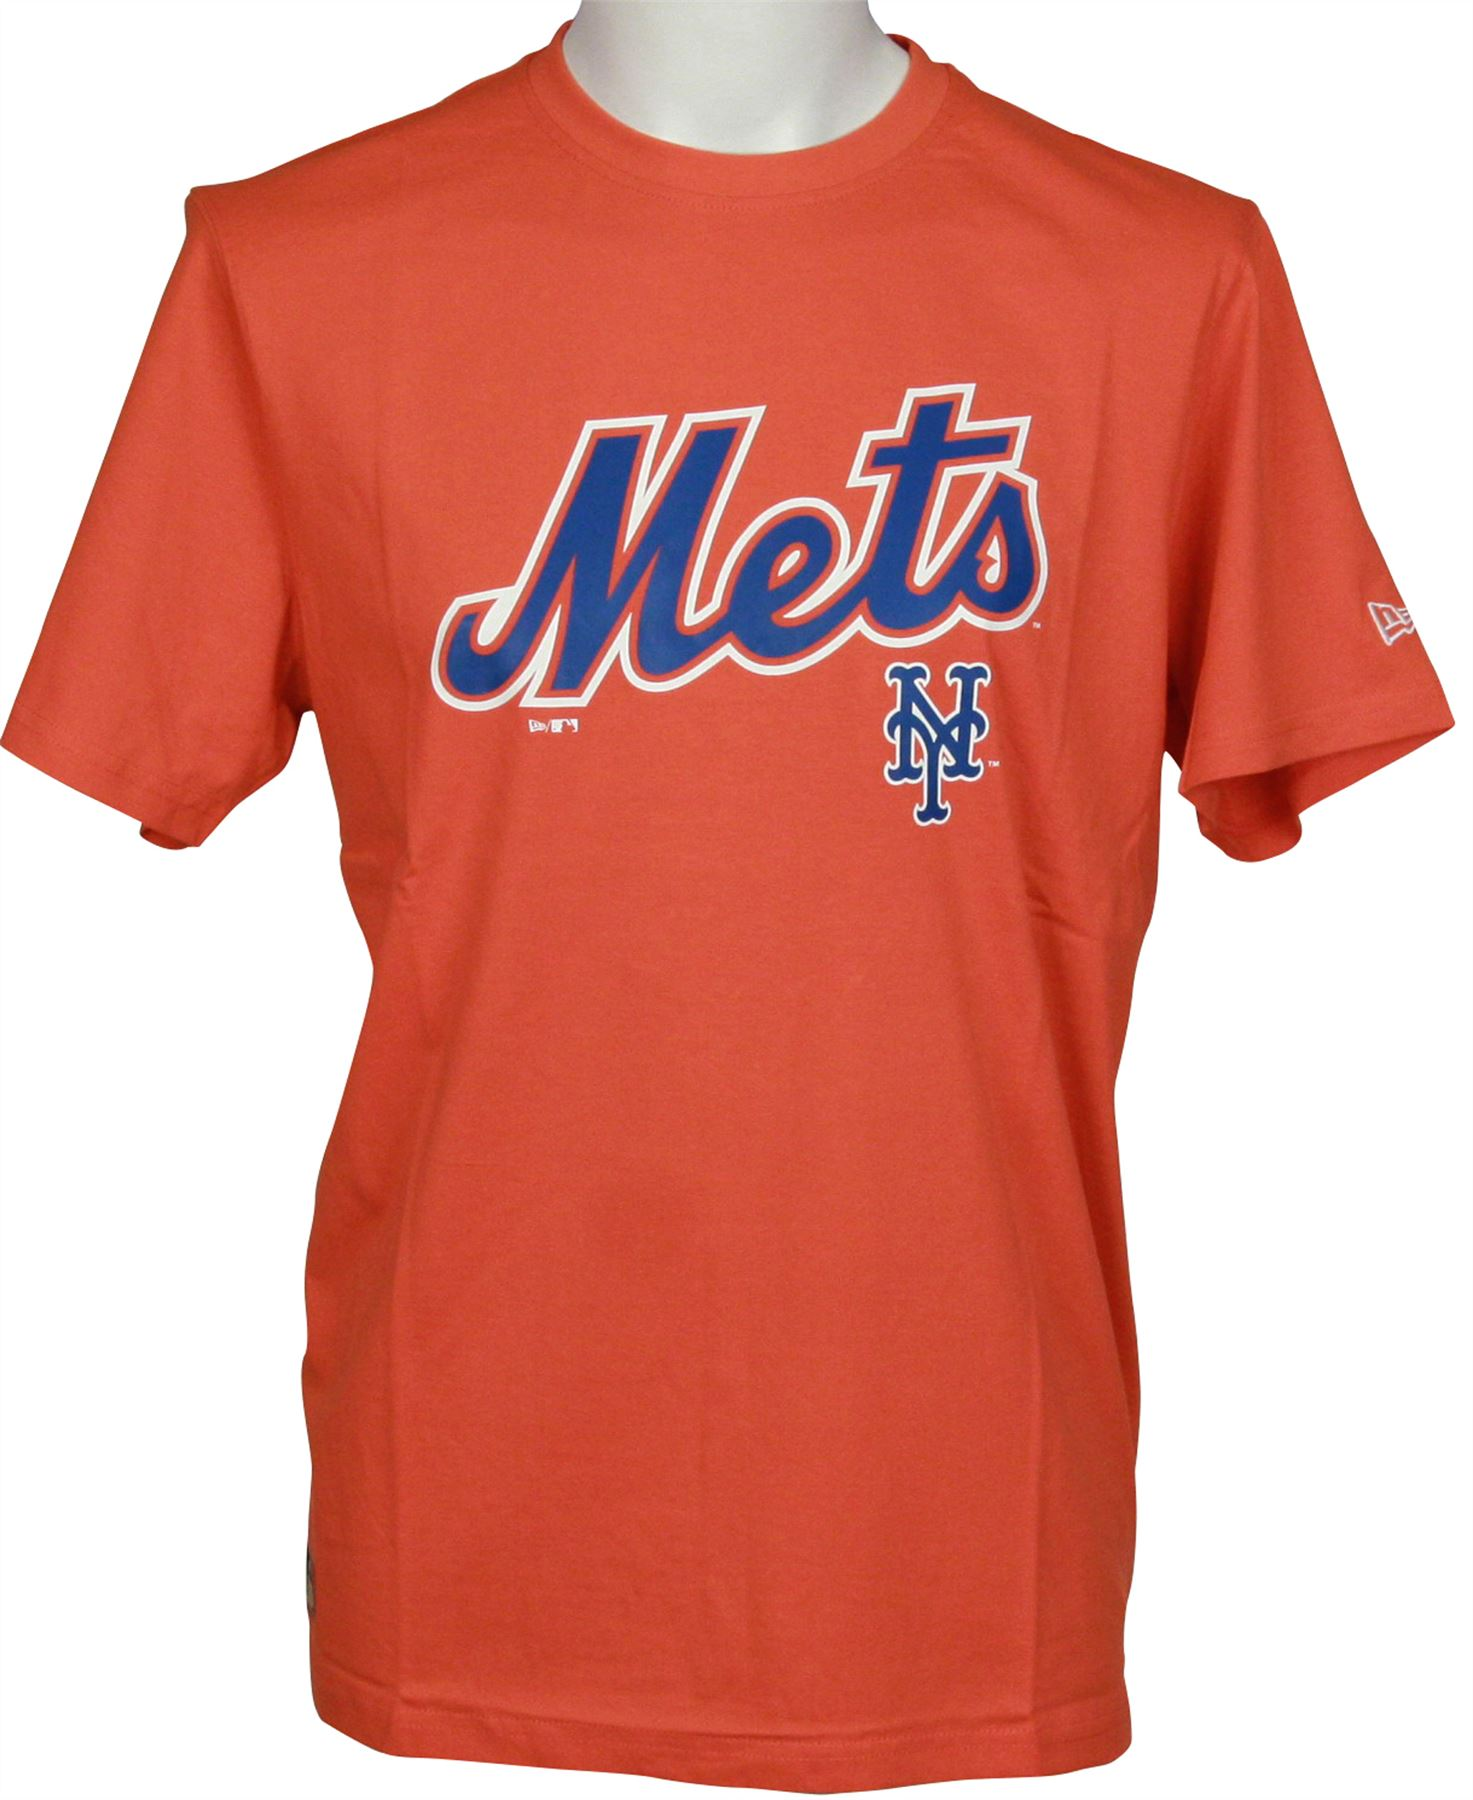 New Era Coop XL T-Shirt ~ New York Mets